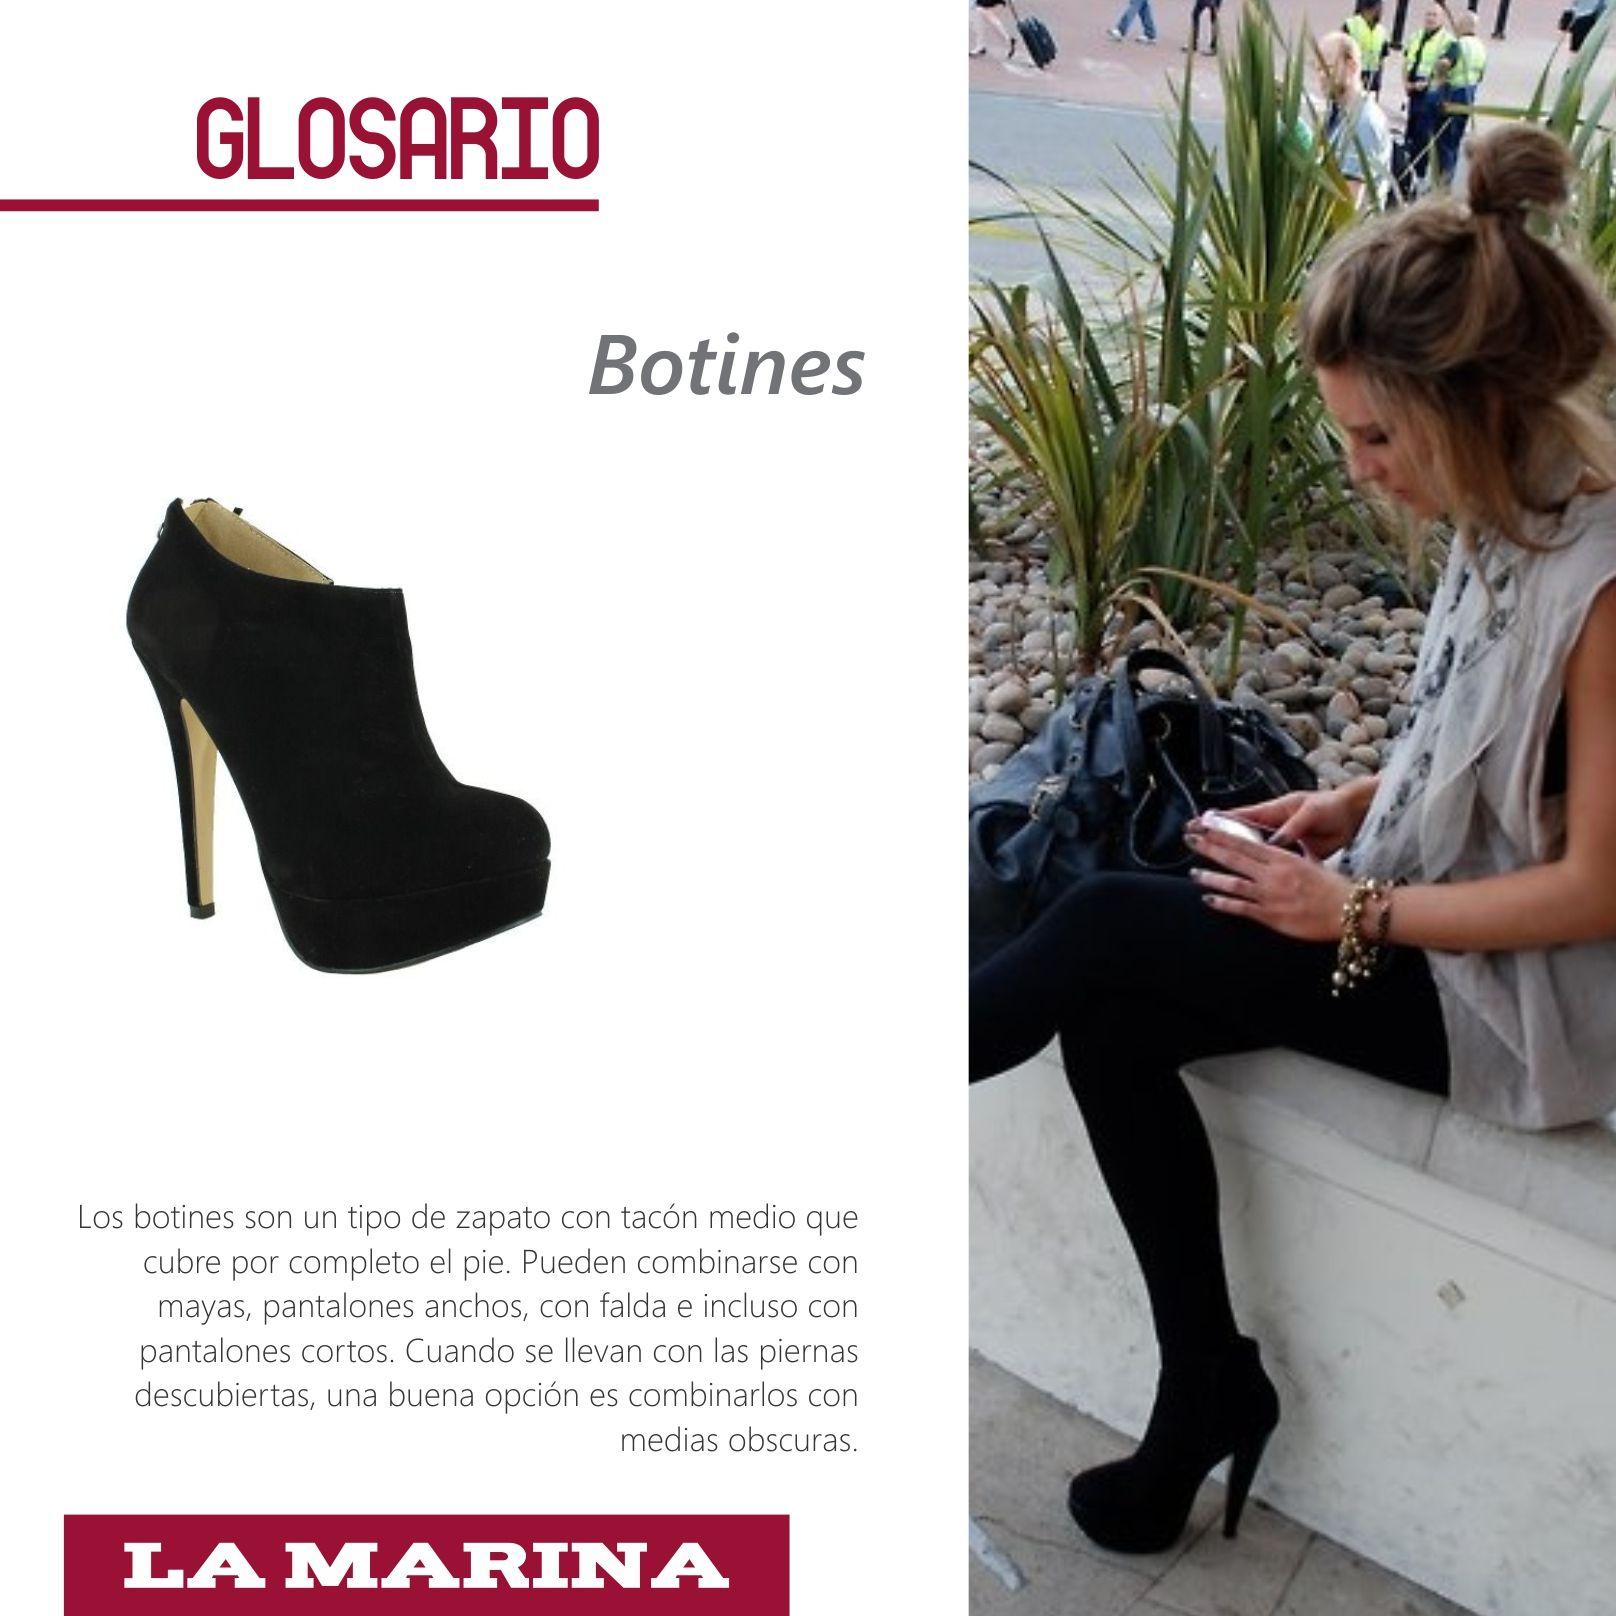 #botines #glosario #fashion